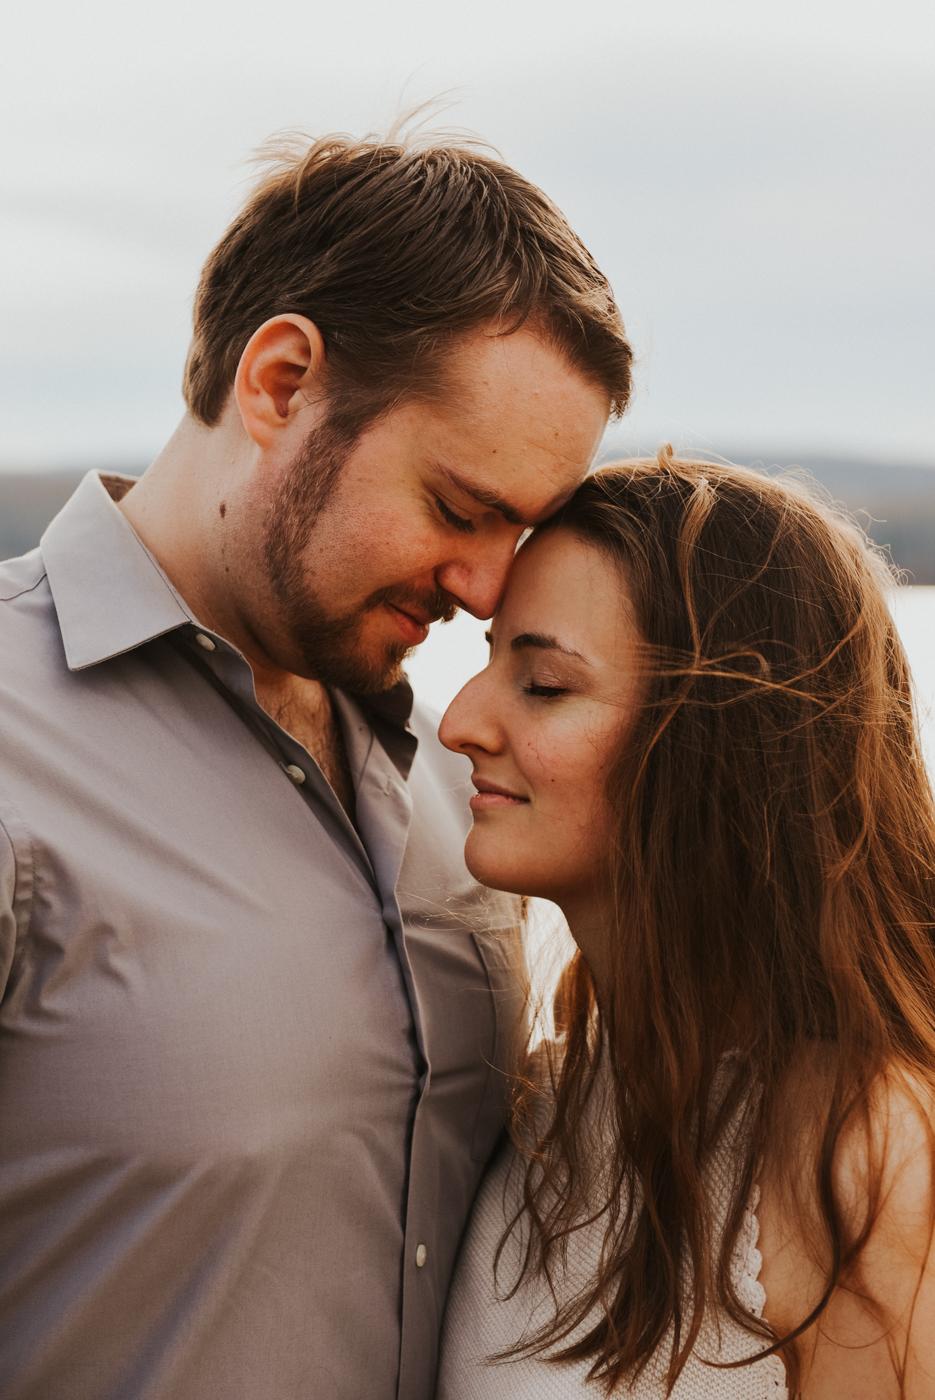 FortSt.John_photographer_TyraEPhotography_Wedding_Couple_Family_Photograhy_DawsonCreek_Elopement_Bride_Boduoir_Portraits-20.jpg